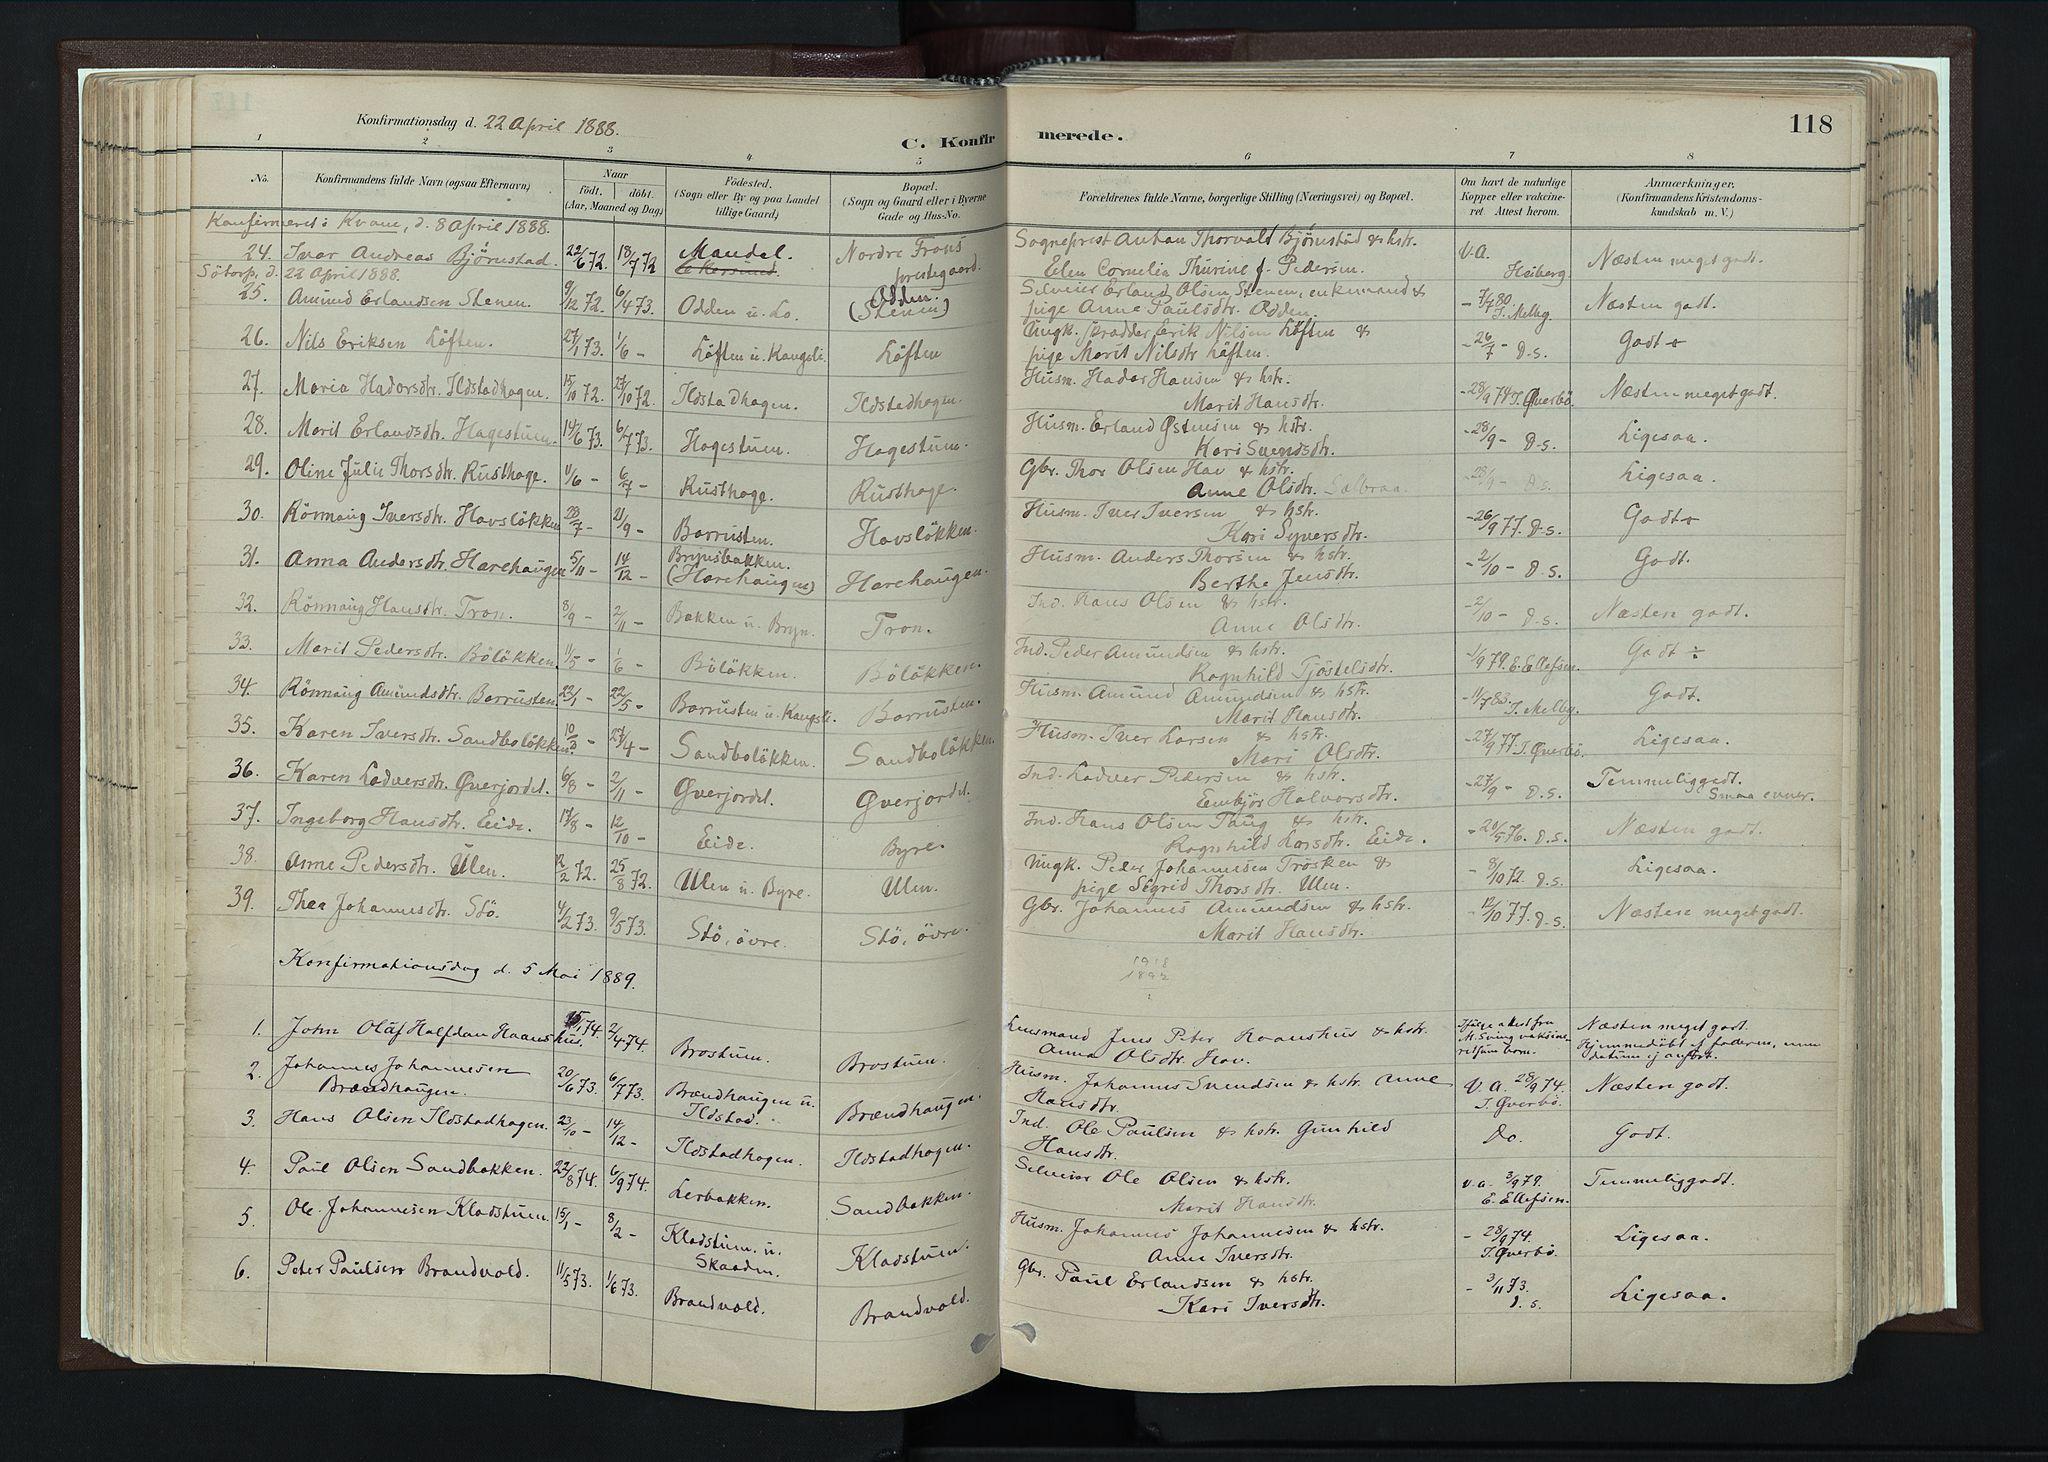 SAH, Nord-Fron prestekontor, Ministerialbok nr. 4, 1884-1914, s. 118